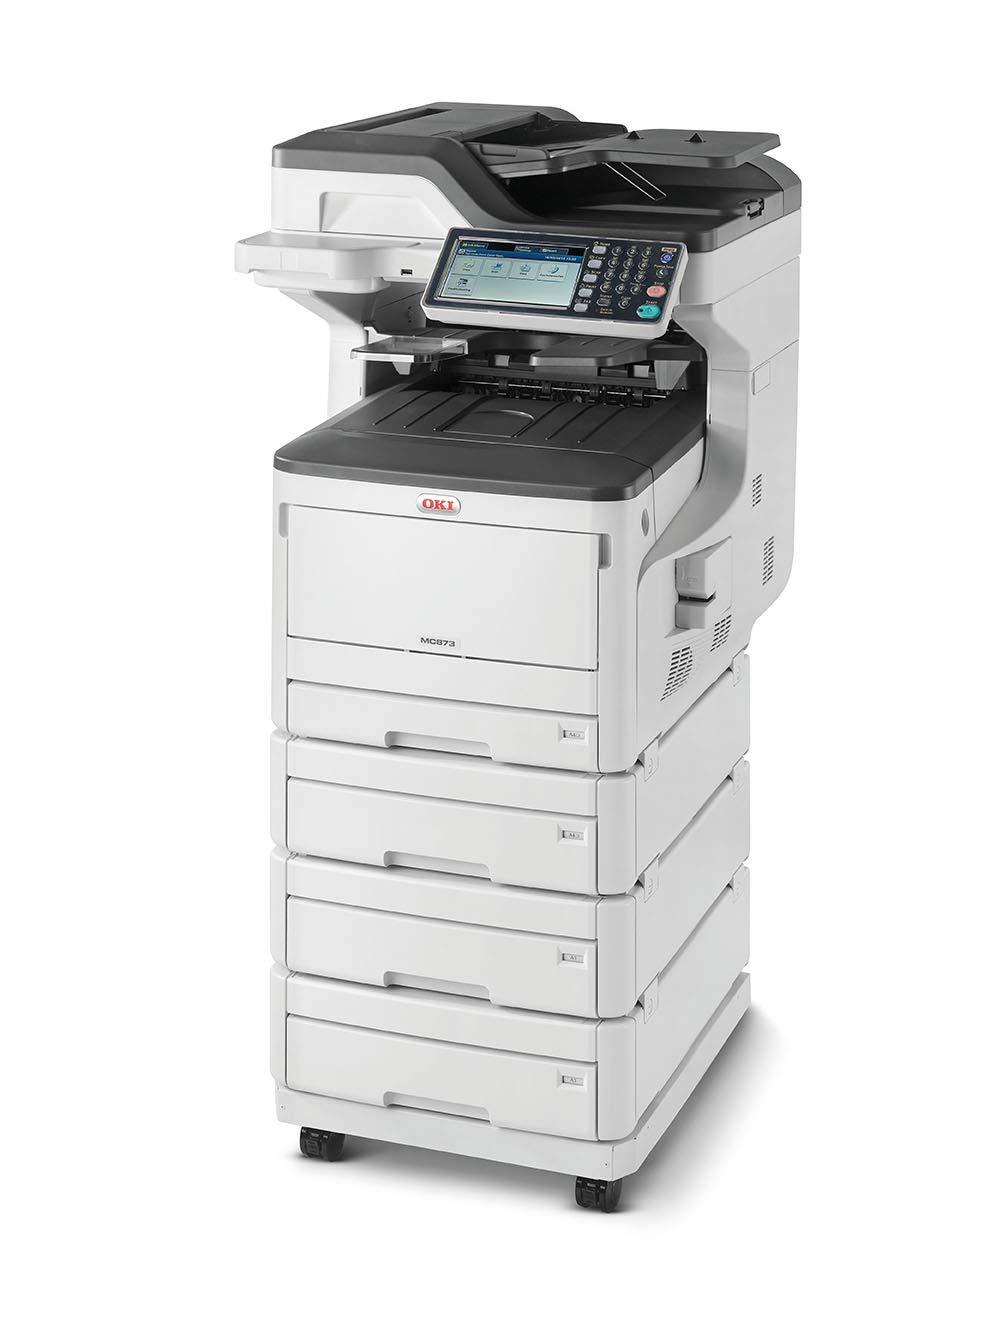 Oki MC873dnv MFP Drucker Duplex A3/ A4 Print Scan Copy fax 45850622